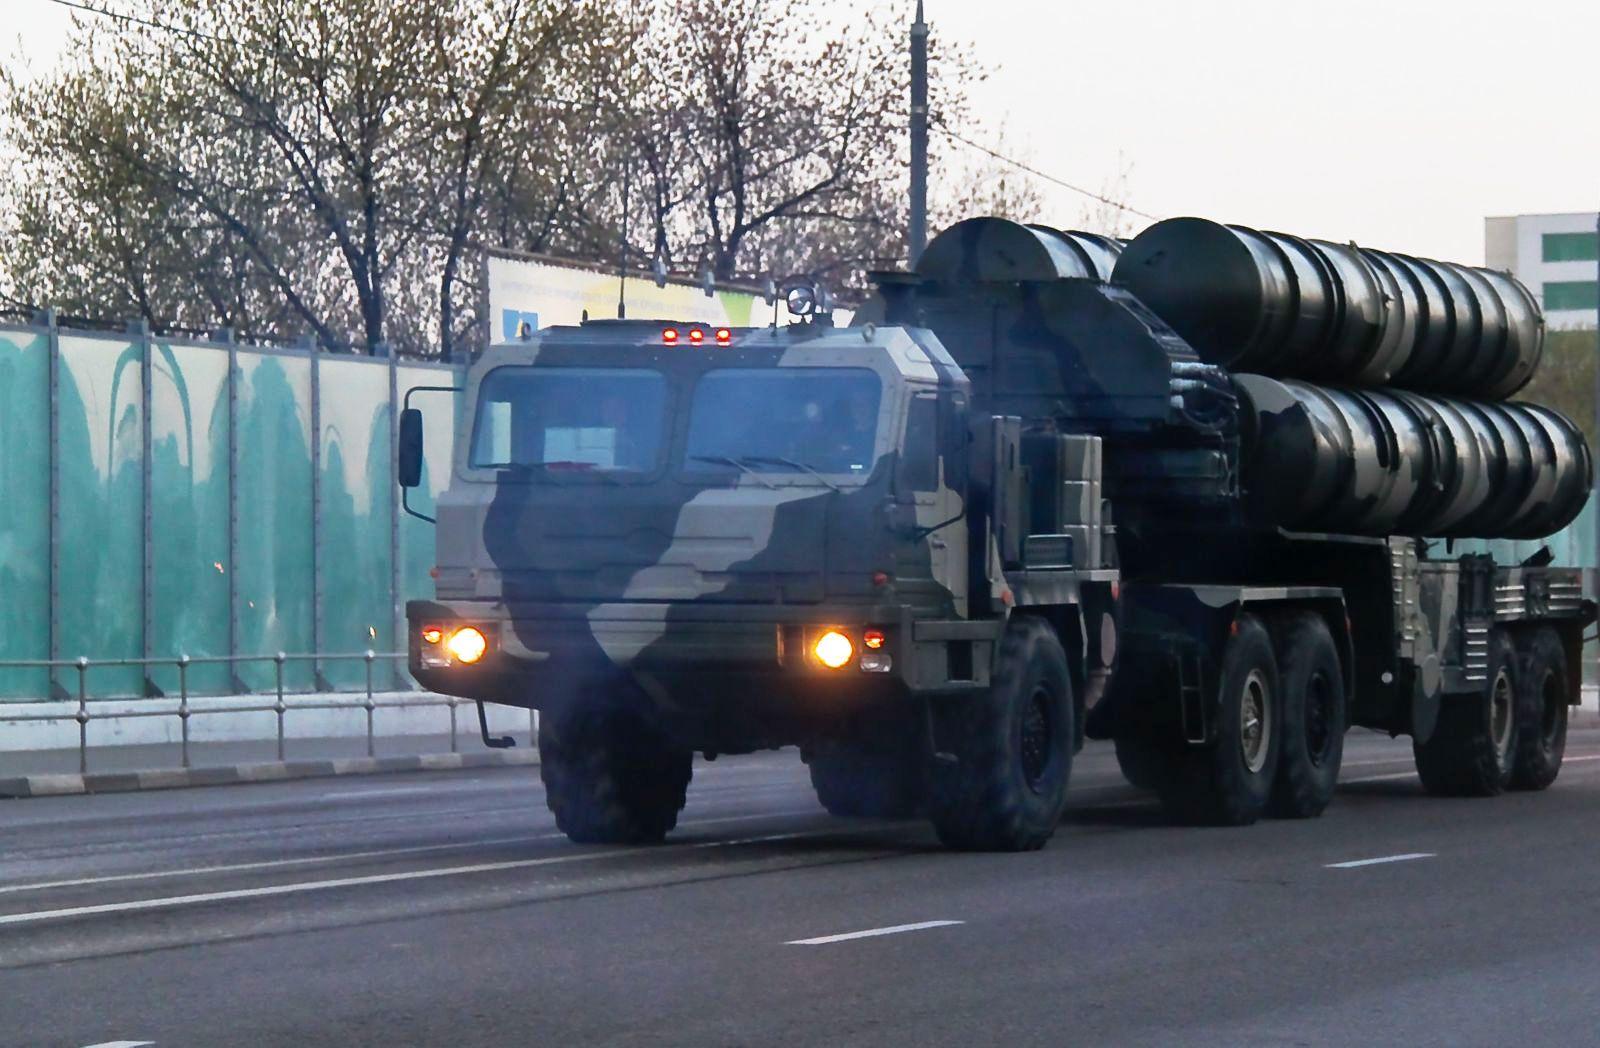 File:Russian S-400 Triumf missile launcher.jpg - Wikimedia Commons